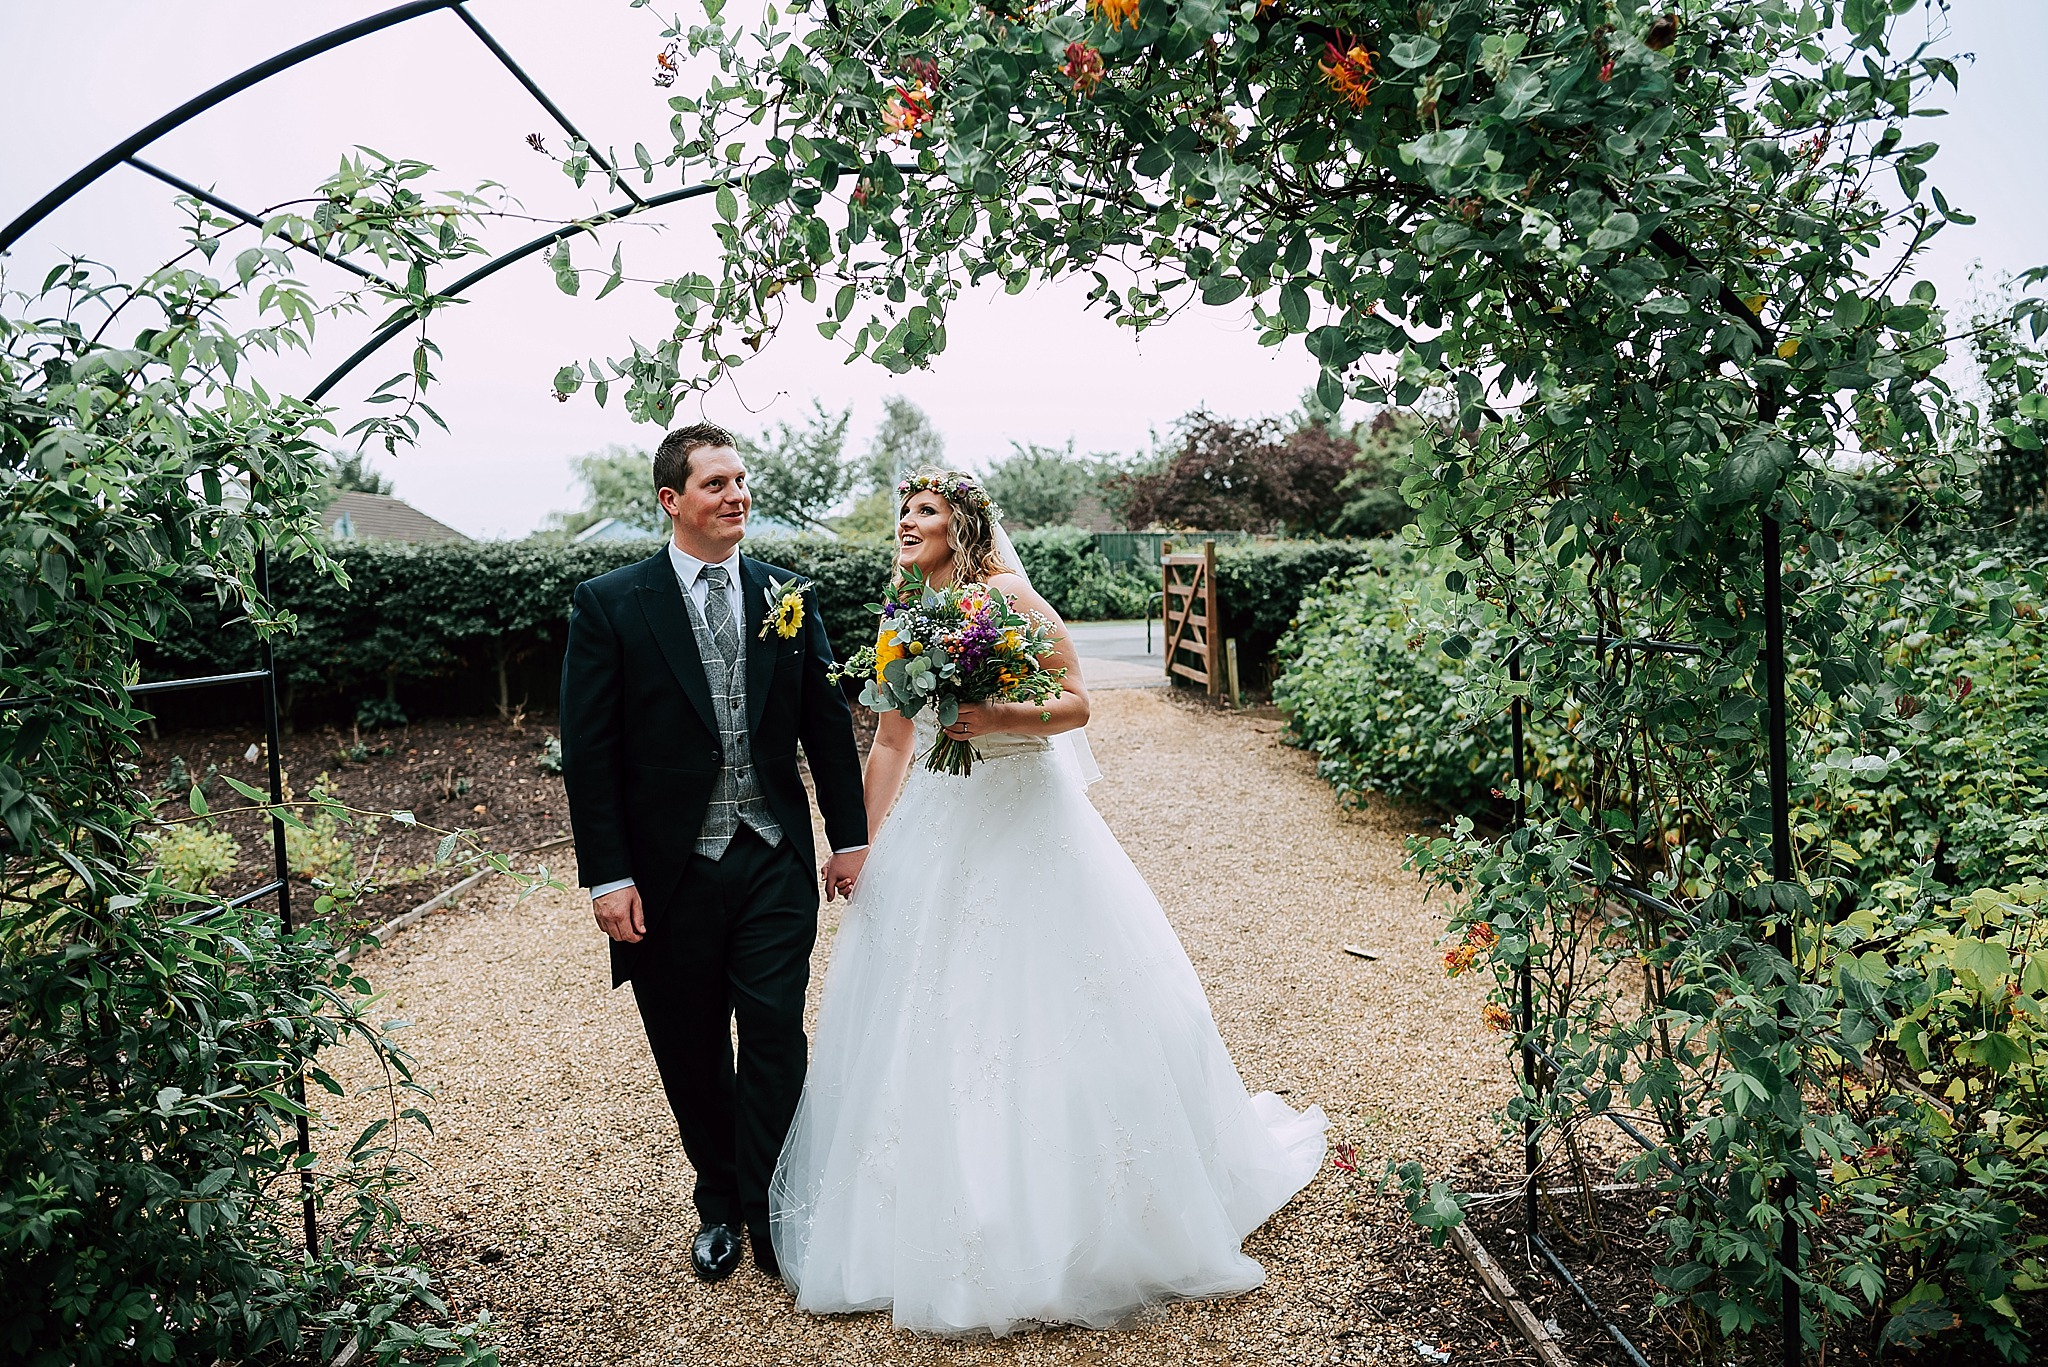 wedding photos in the village garden at ribby hall